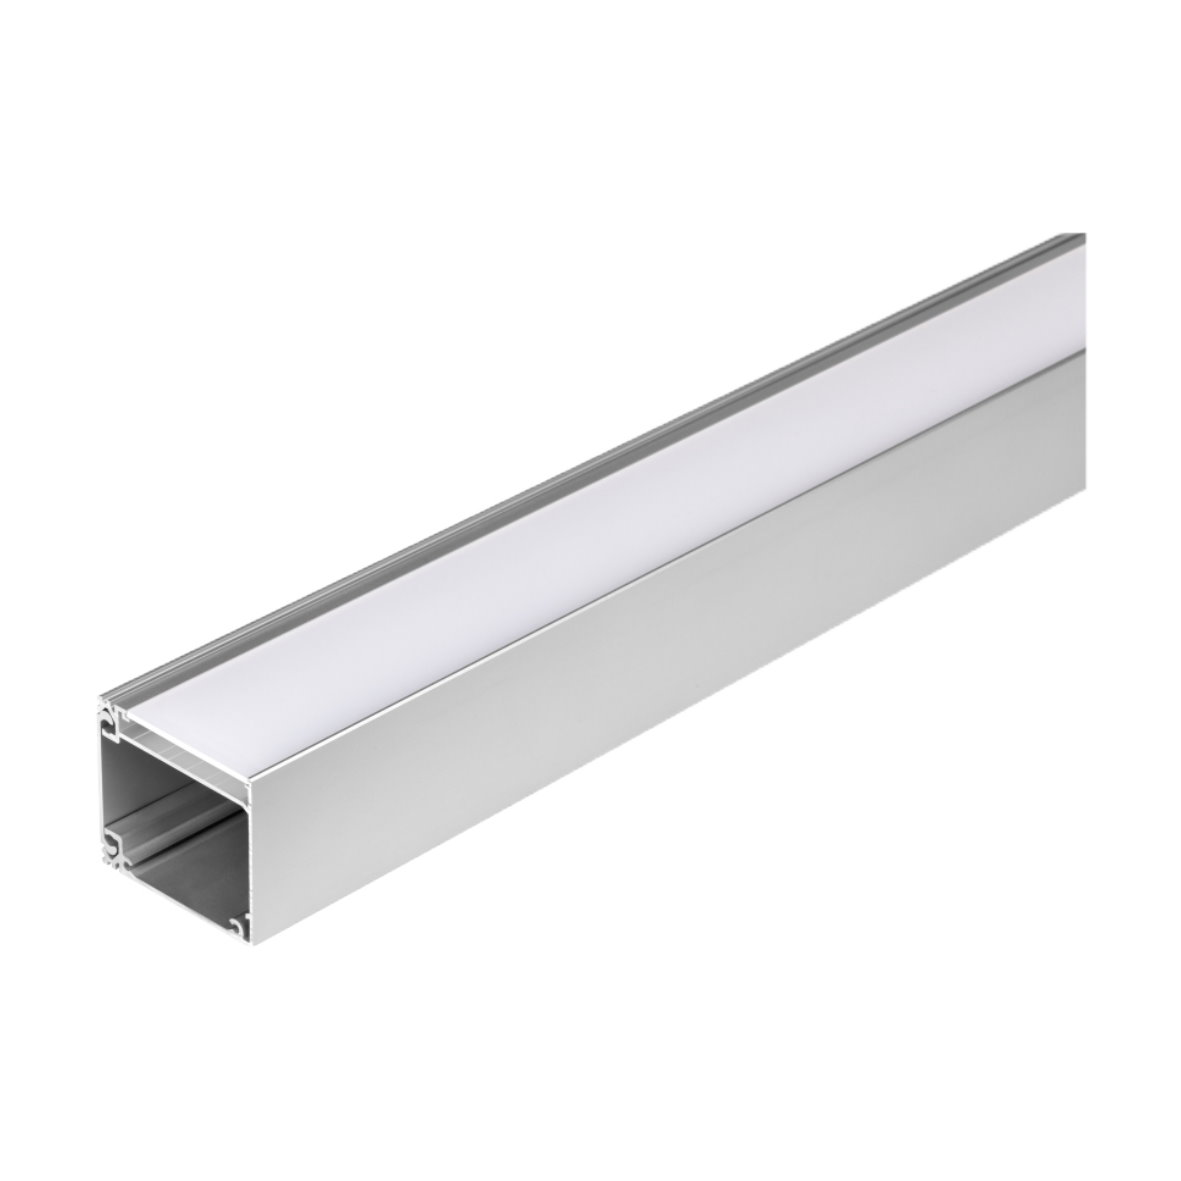 39 9 m led alu profil eloxiert abdeckung aluprofil aluminium lichtband ebay. Black Bedroom Furniture Sets. Home Design Ideas